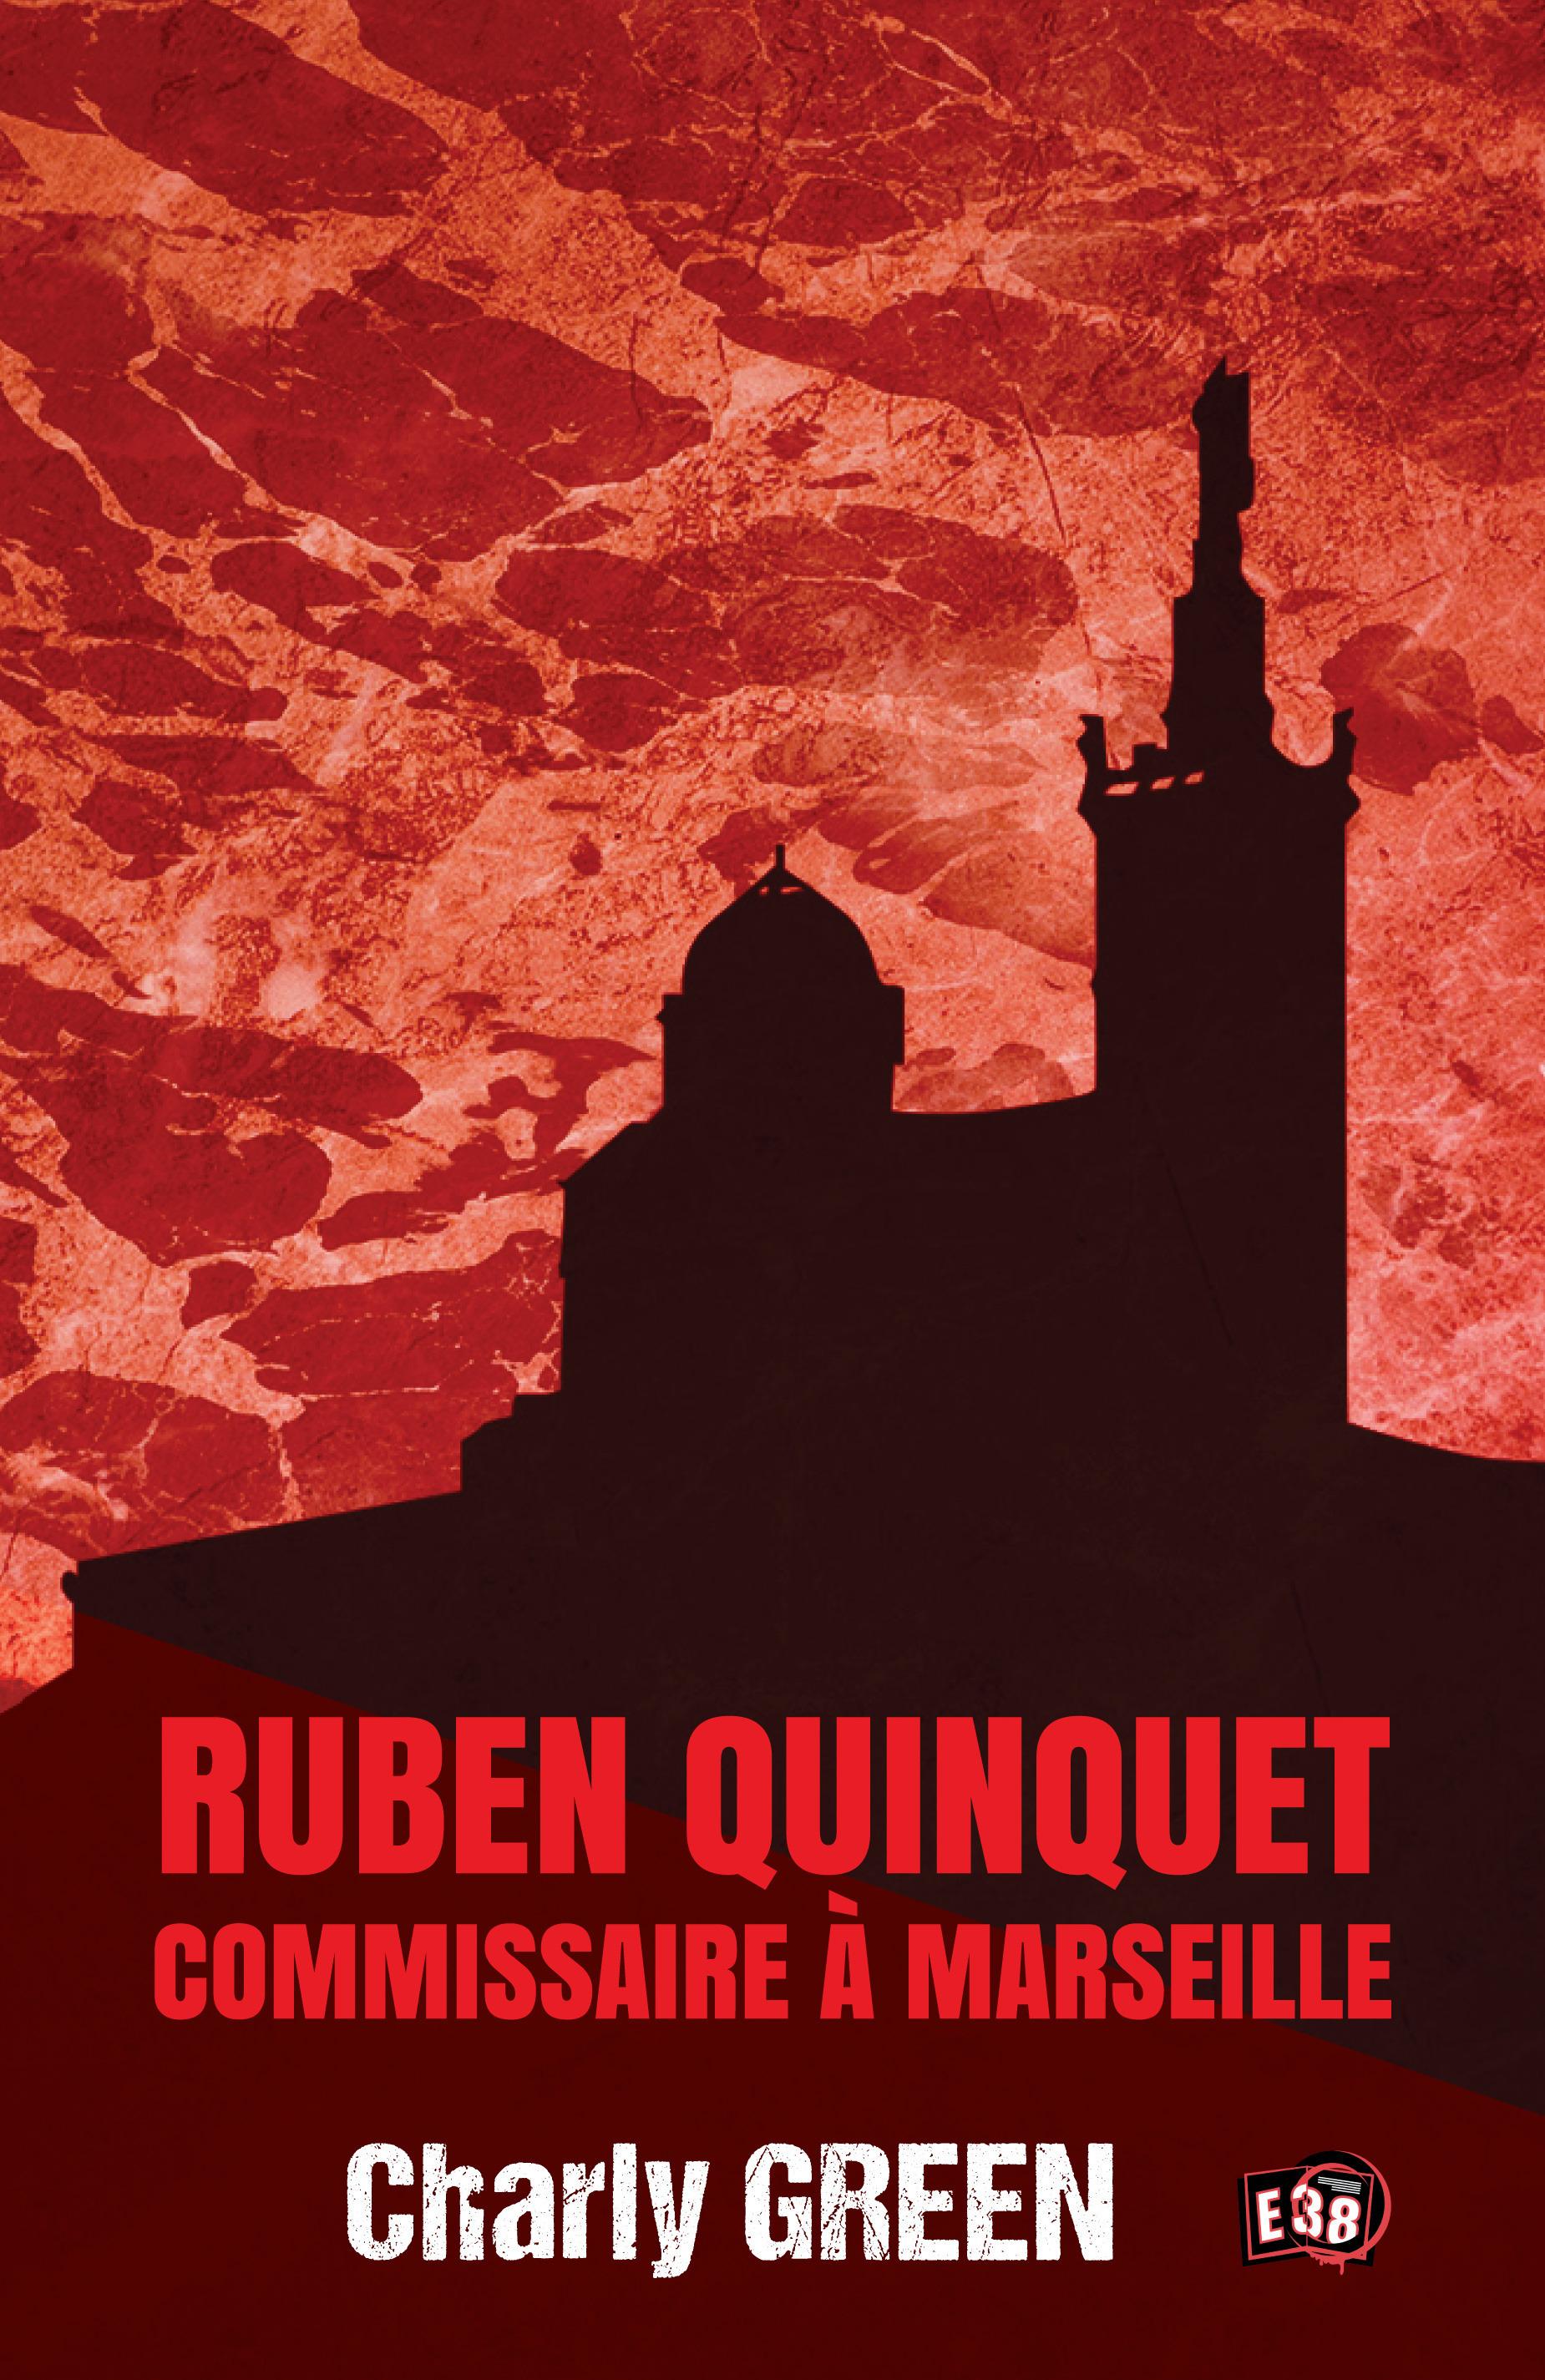 Ruben Quinquet, commissaire à Marseille  - Charly Green